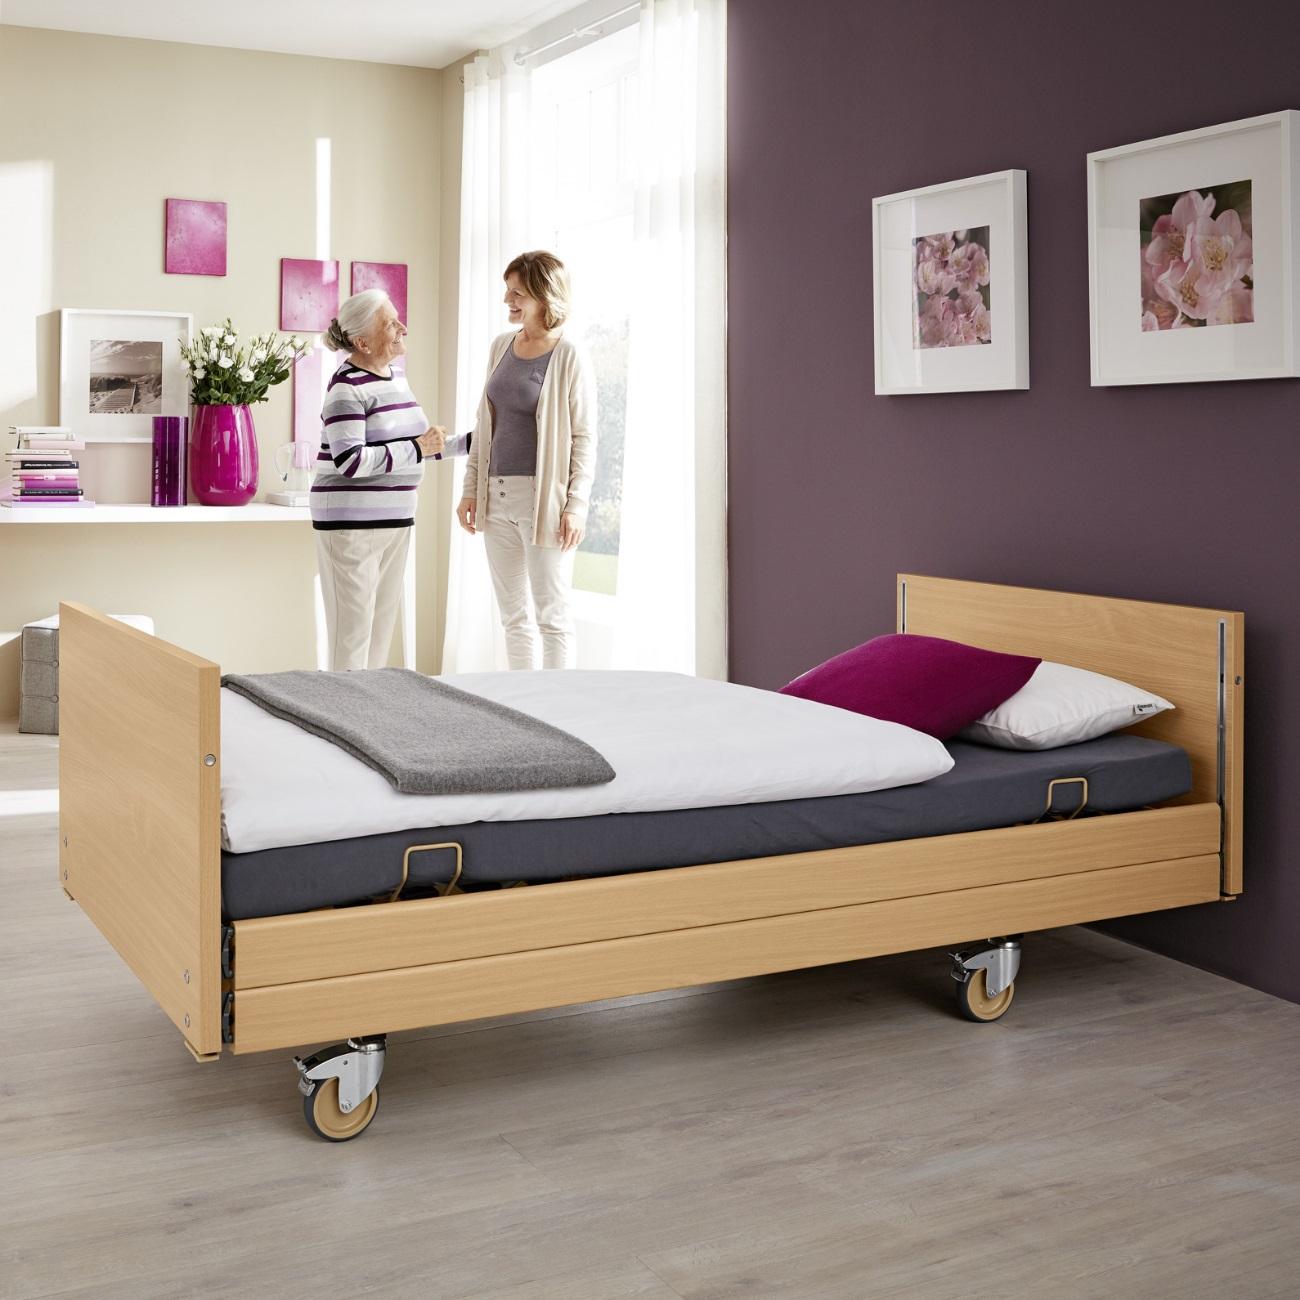 burmeier westfalia iv pflegebett online bestellen online sanit tshaus. Black Bedroom Furniture Sets. Home Design Ideas